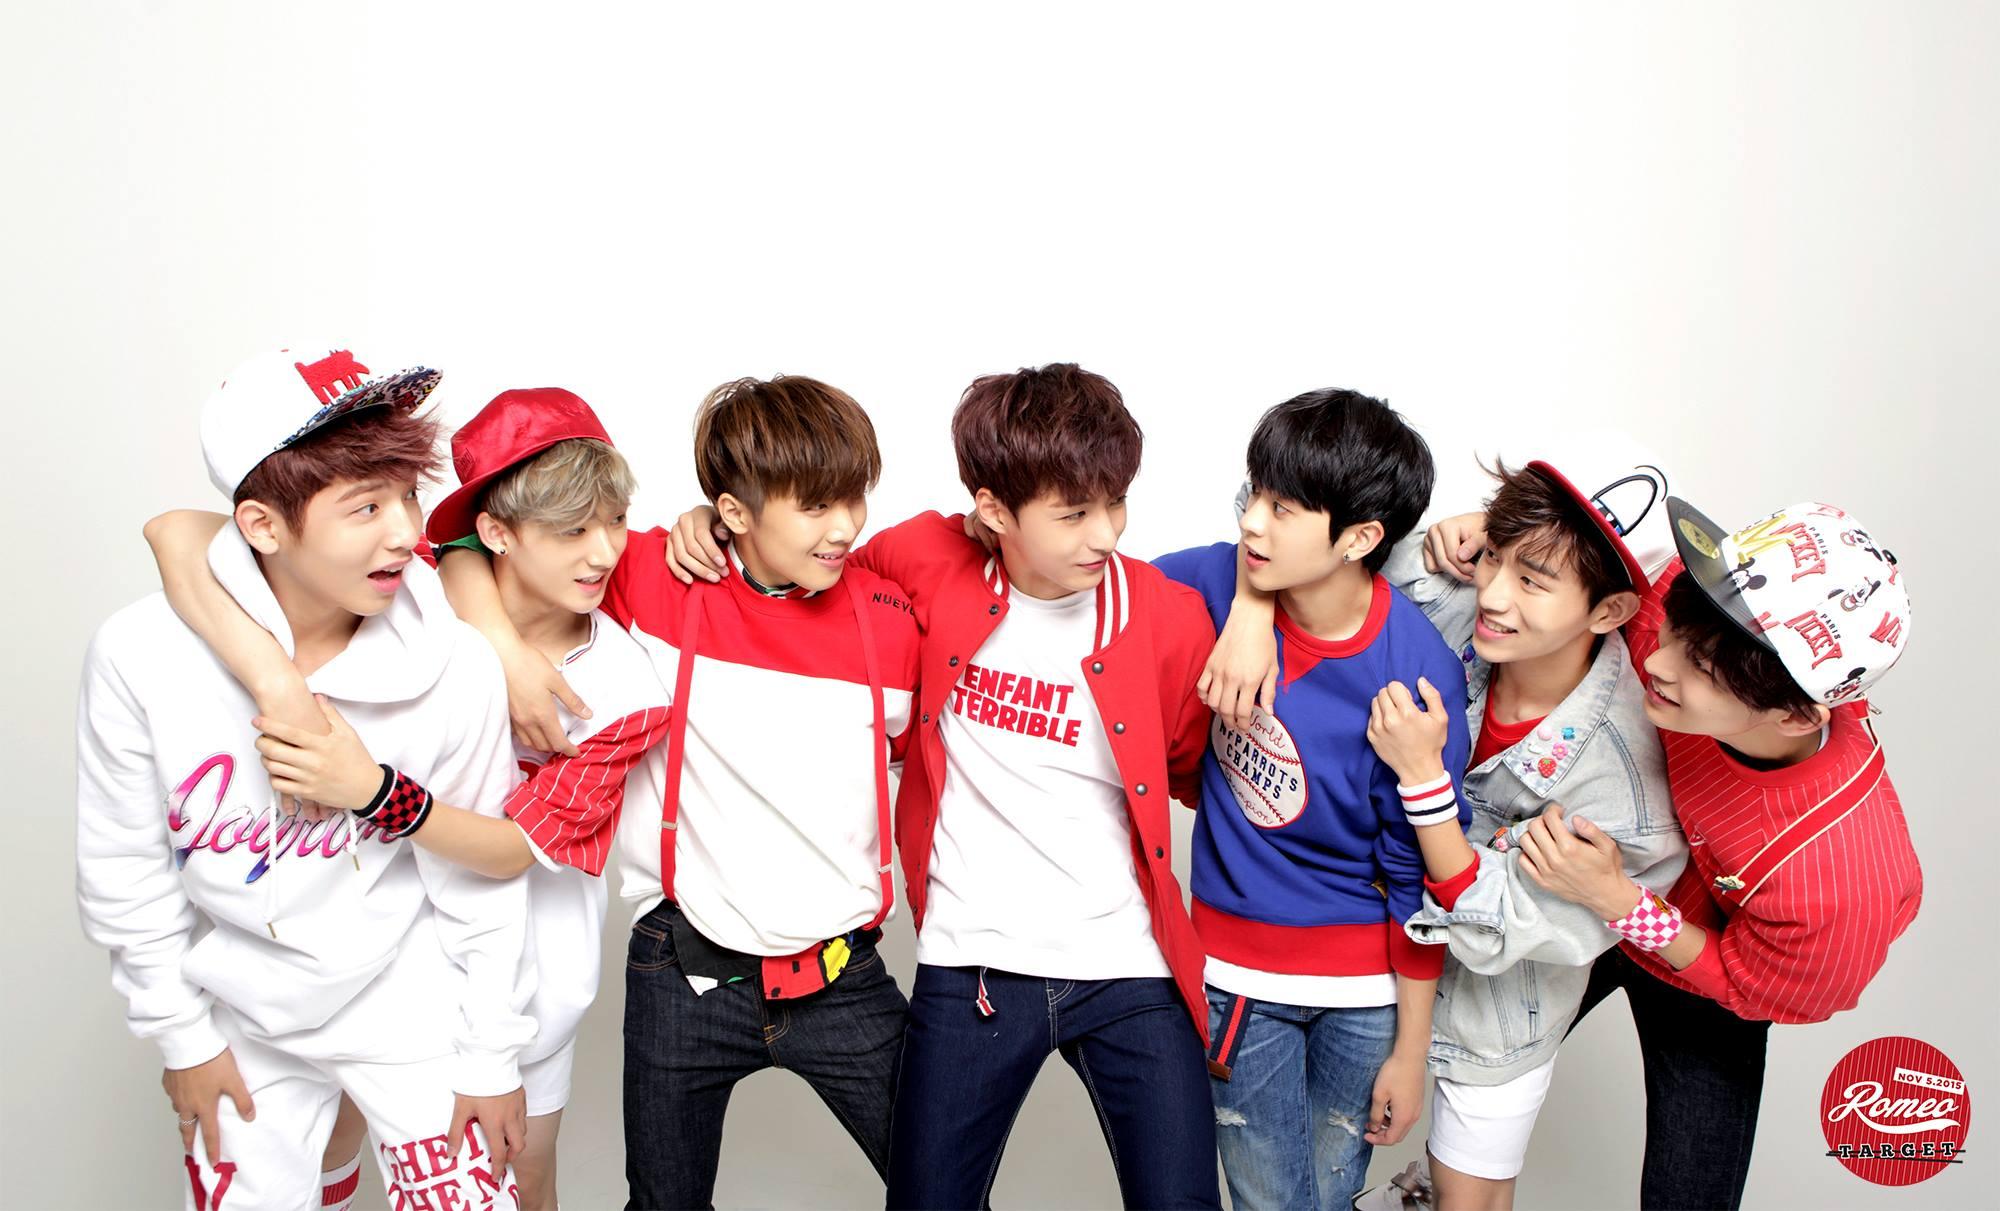 romeo, kpop romeo, romeo profile, kpop romeo profile, romeo members ...